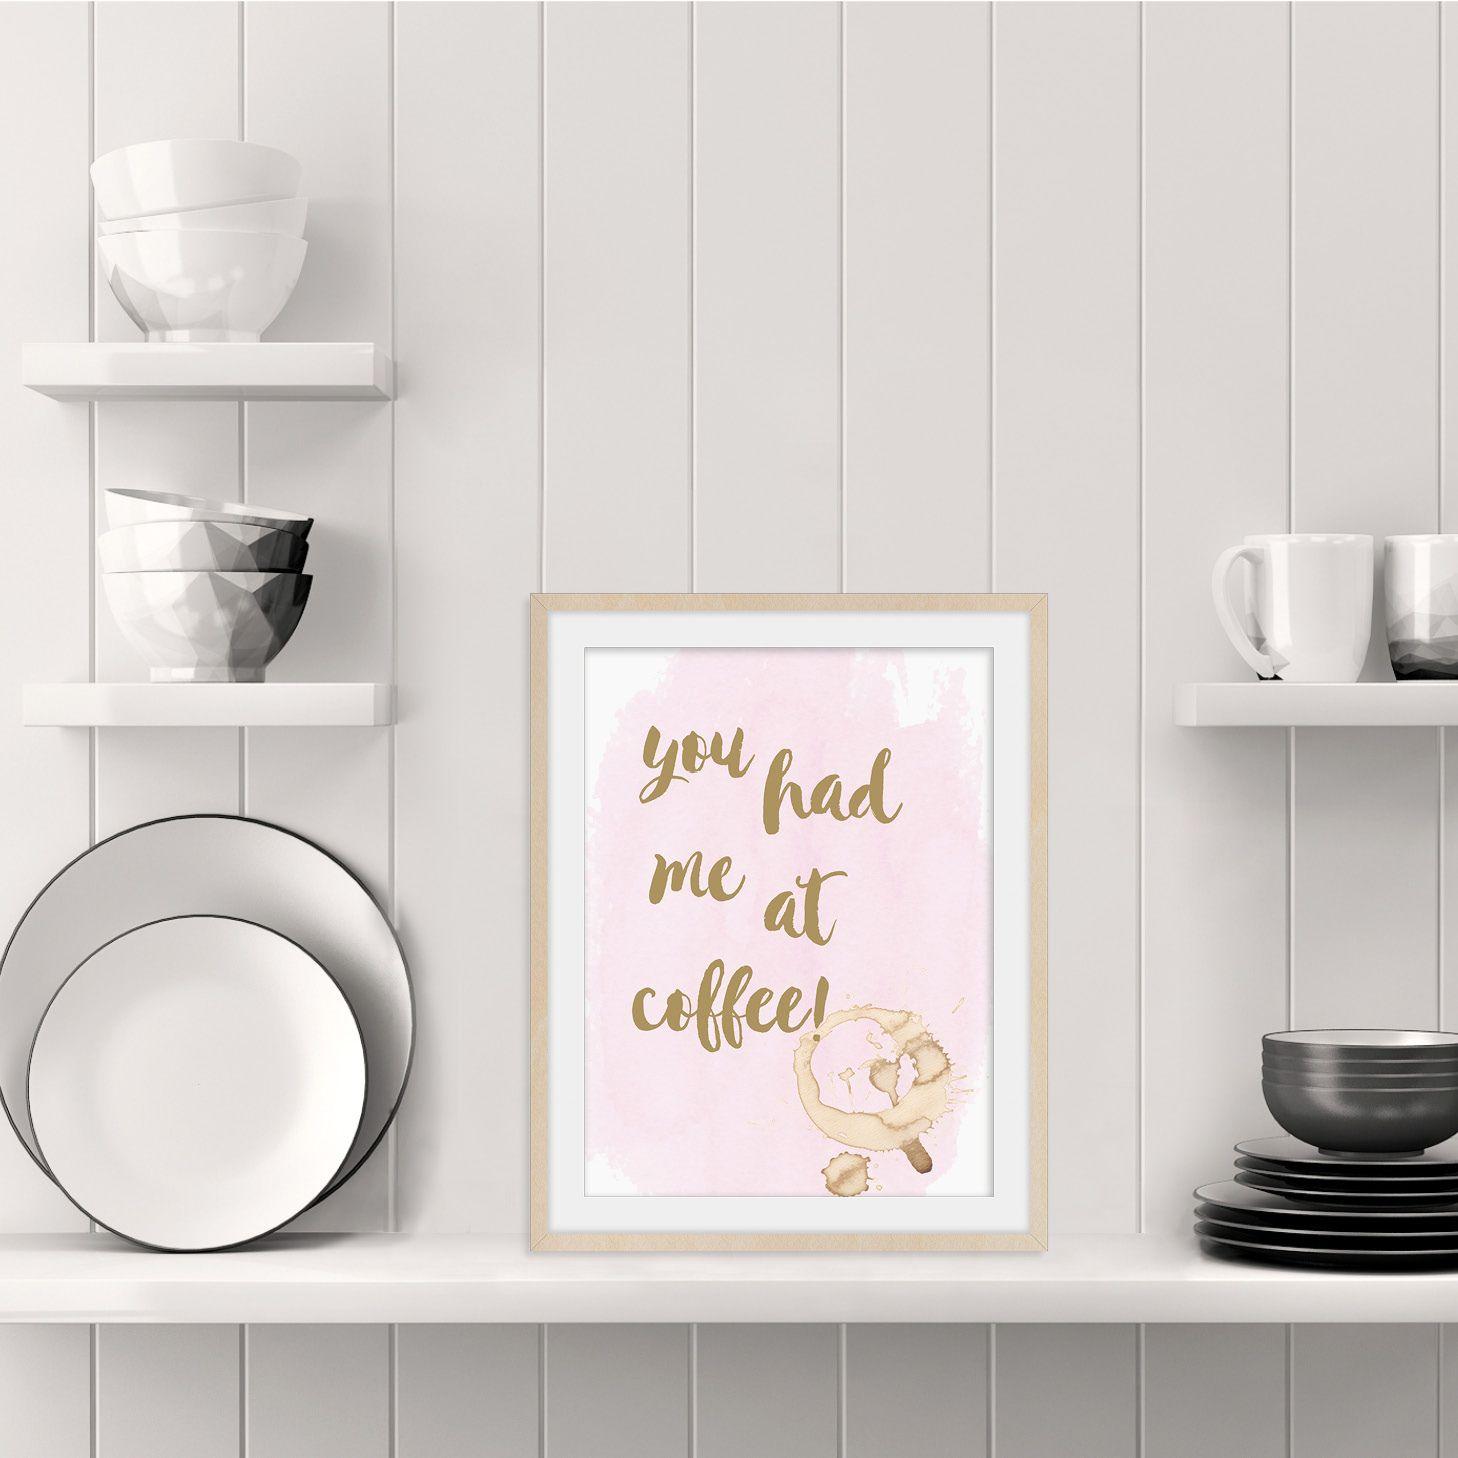 Coffee Poster Trendy home decor, Kmart home, Decor